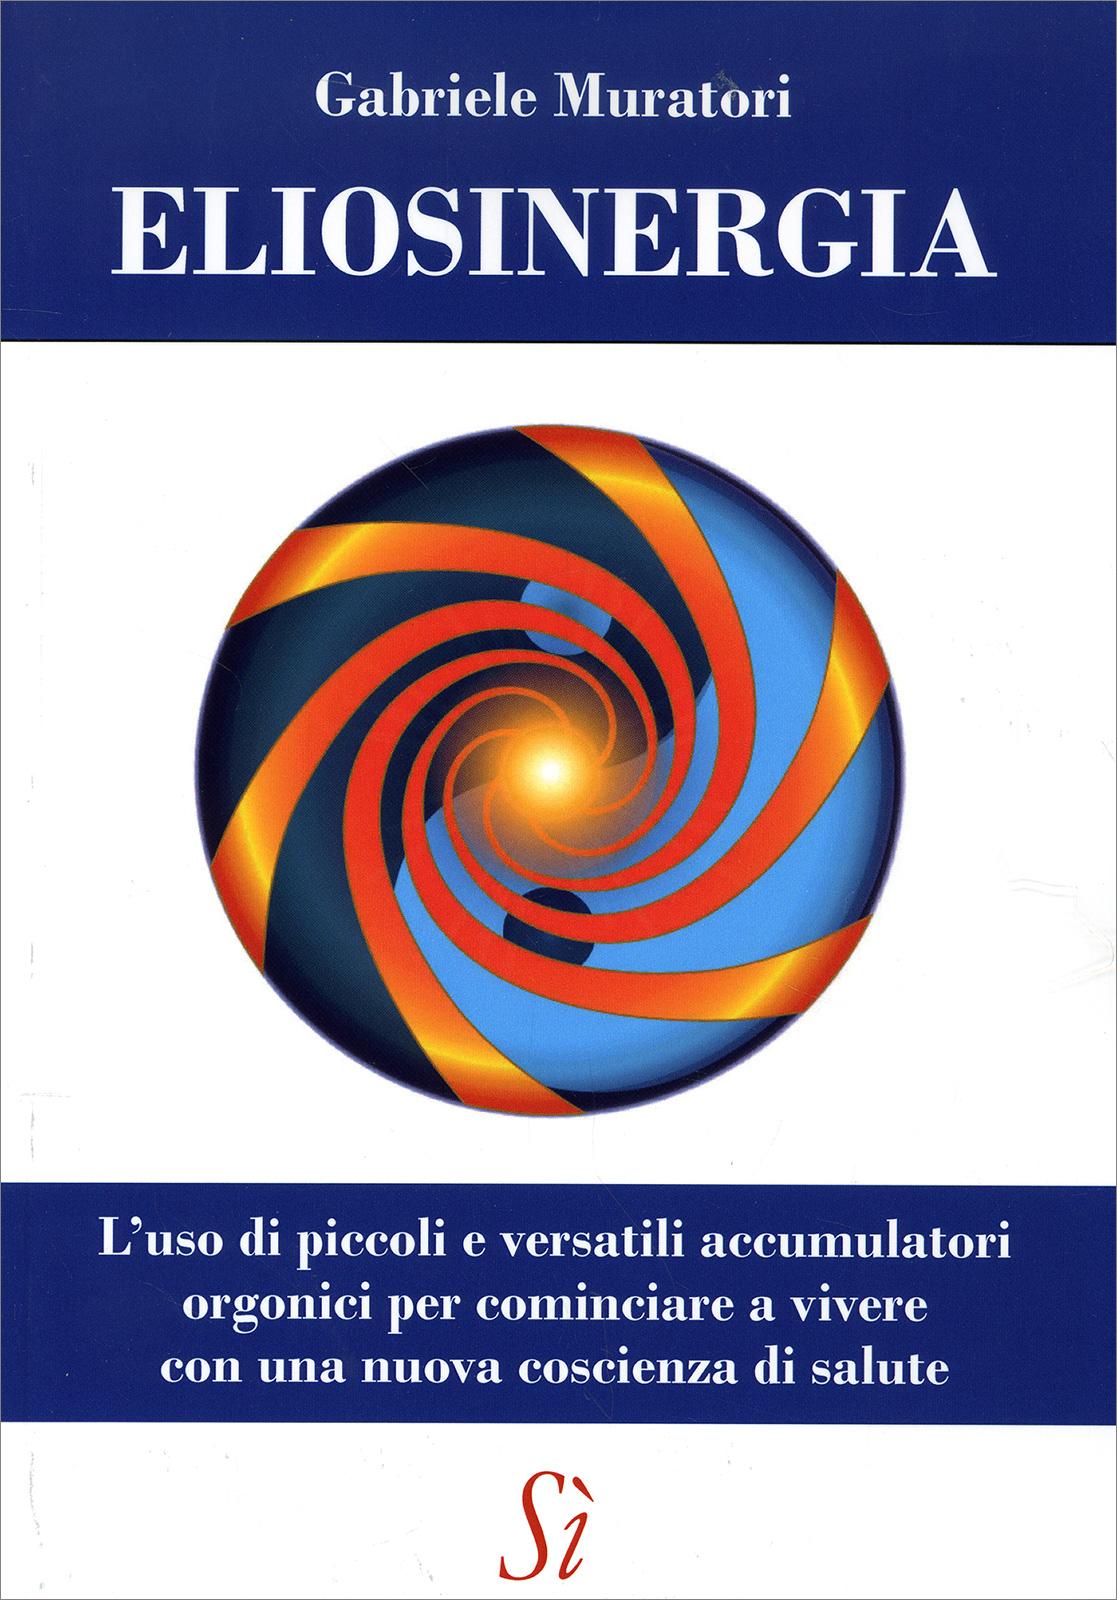 Eliosinergia - Libro di Gabriele Muratori